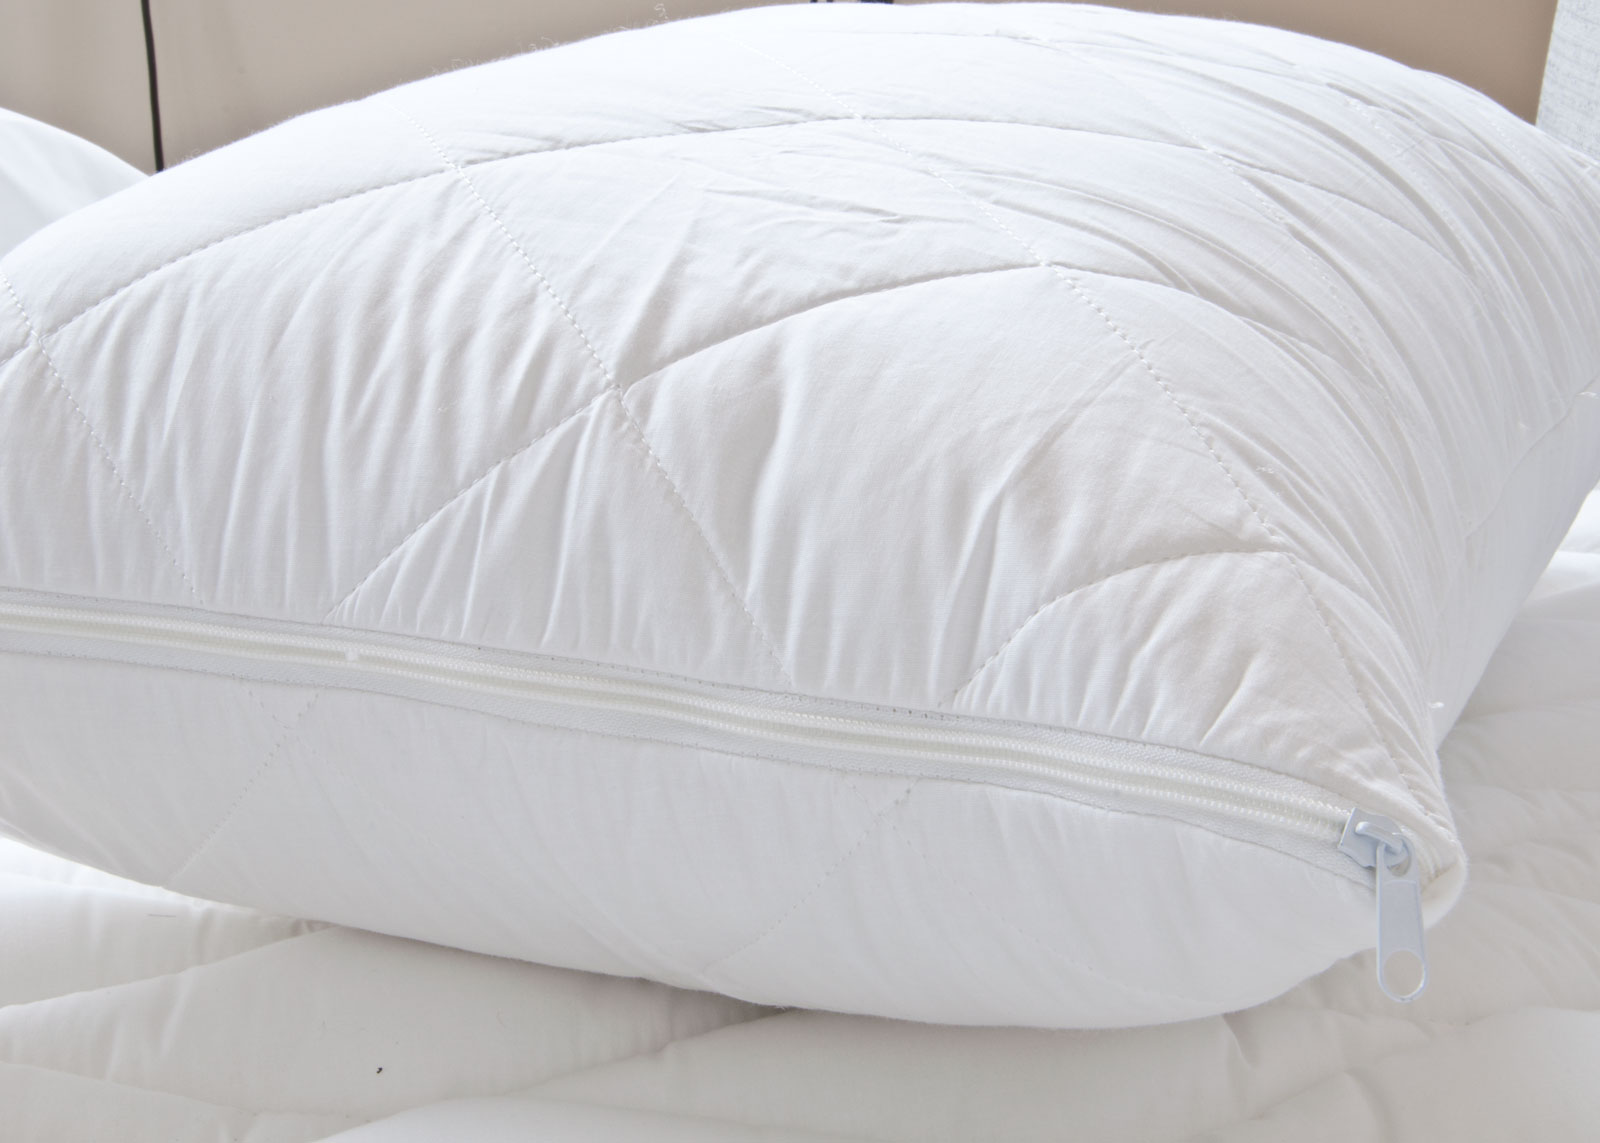 egyptian cotton pillow protector pair | egyptian cotton | bedding Cotton Pillow